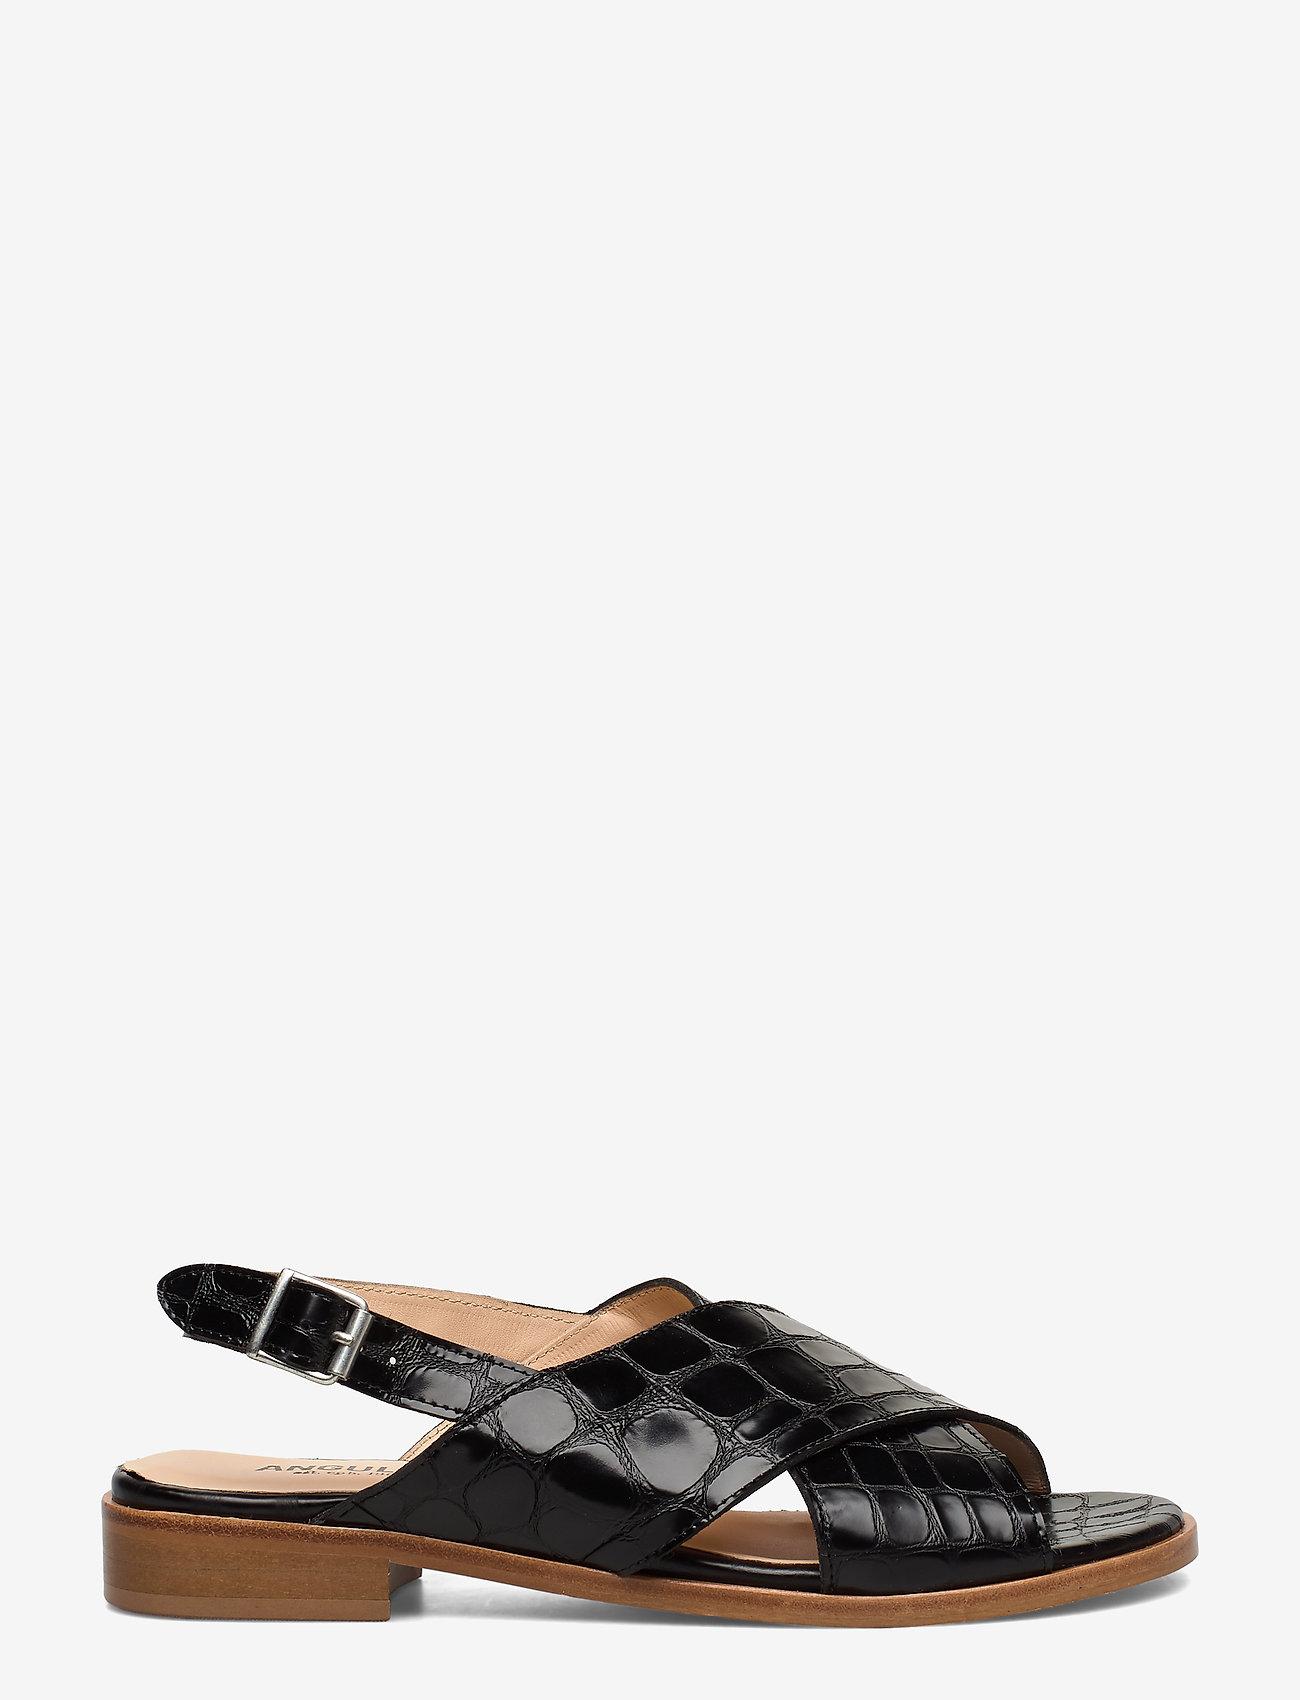 ANGULUS - Sandals - flat - flache sandalen - 1674 black croco - 1